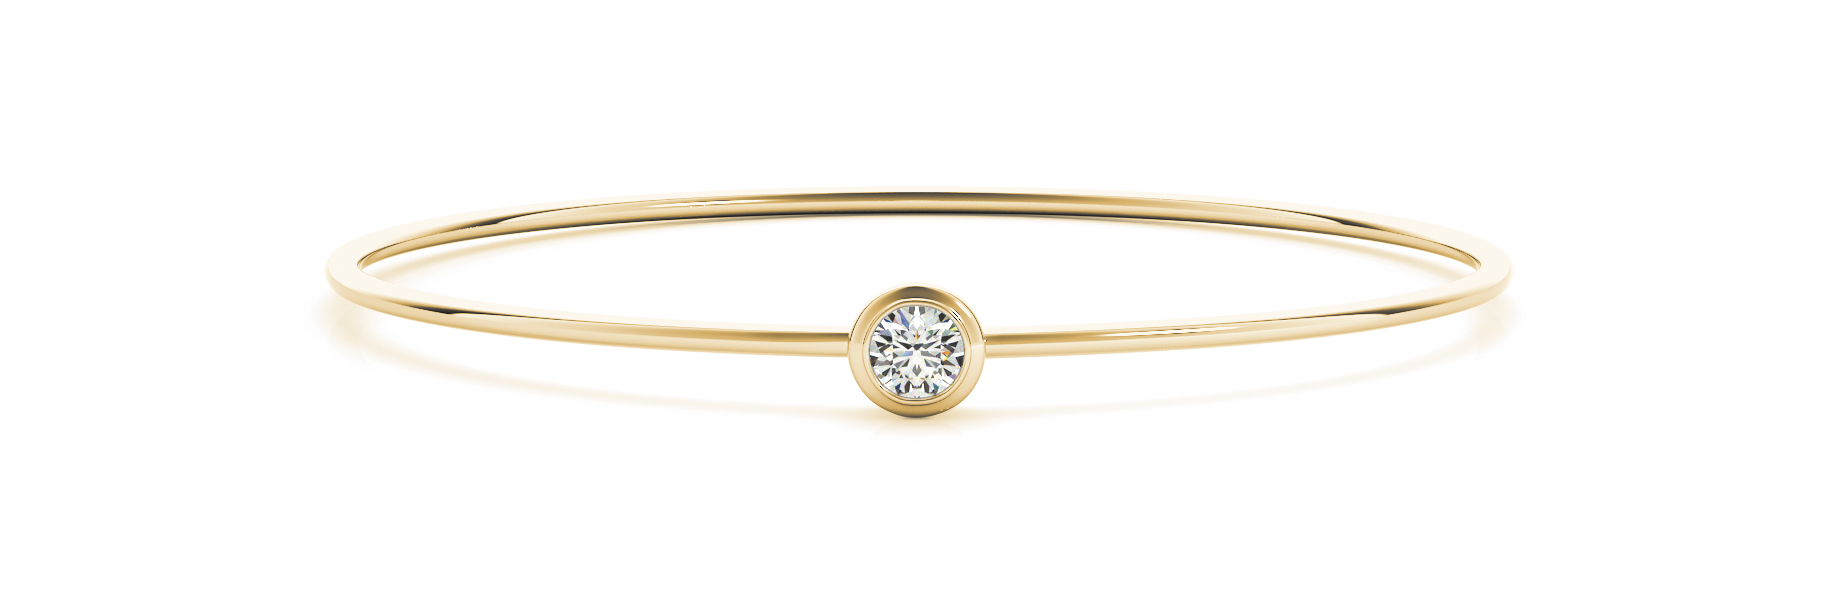 Yellow Gold Single Diamond Bangle Bracelet